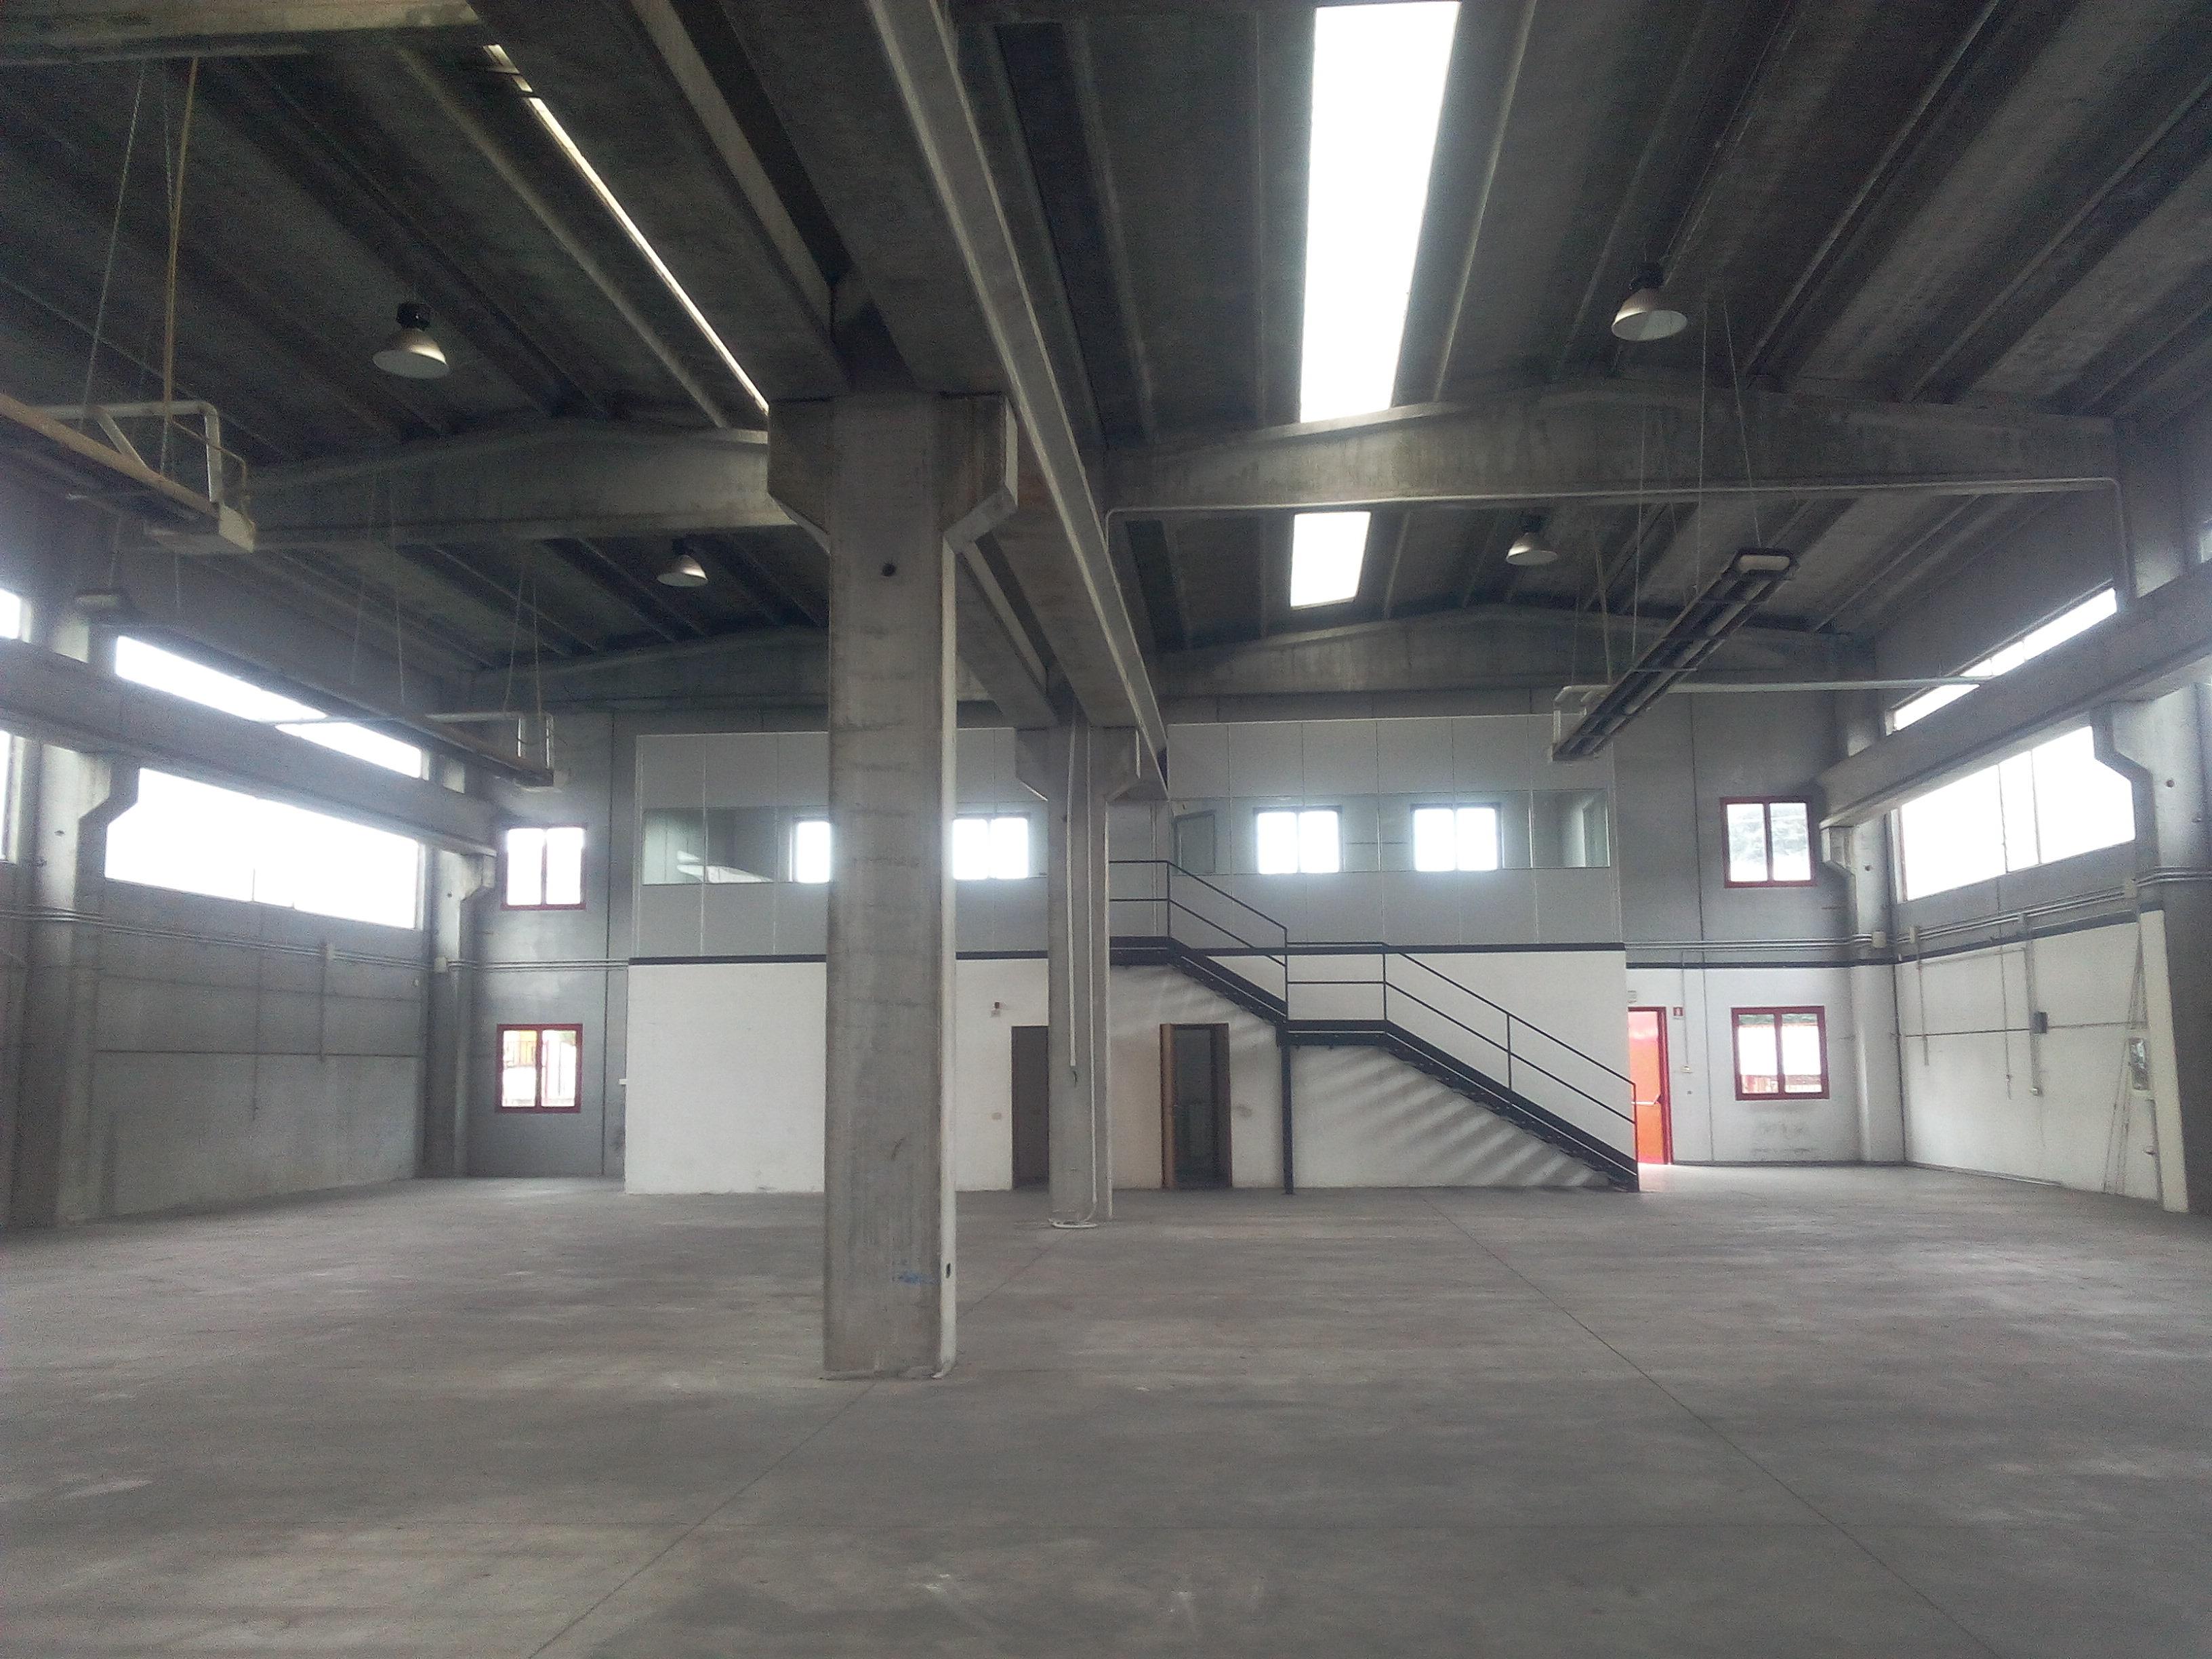 Villasanta – capannone fronte strada con ampia area esterna